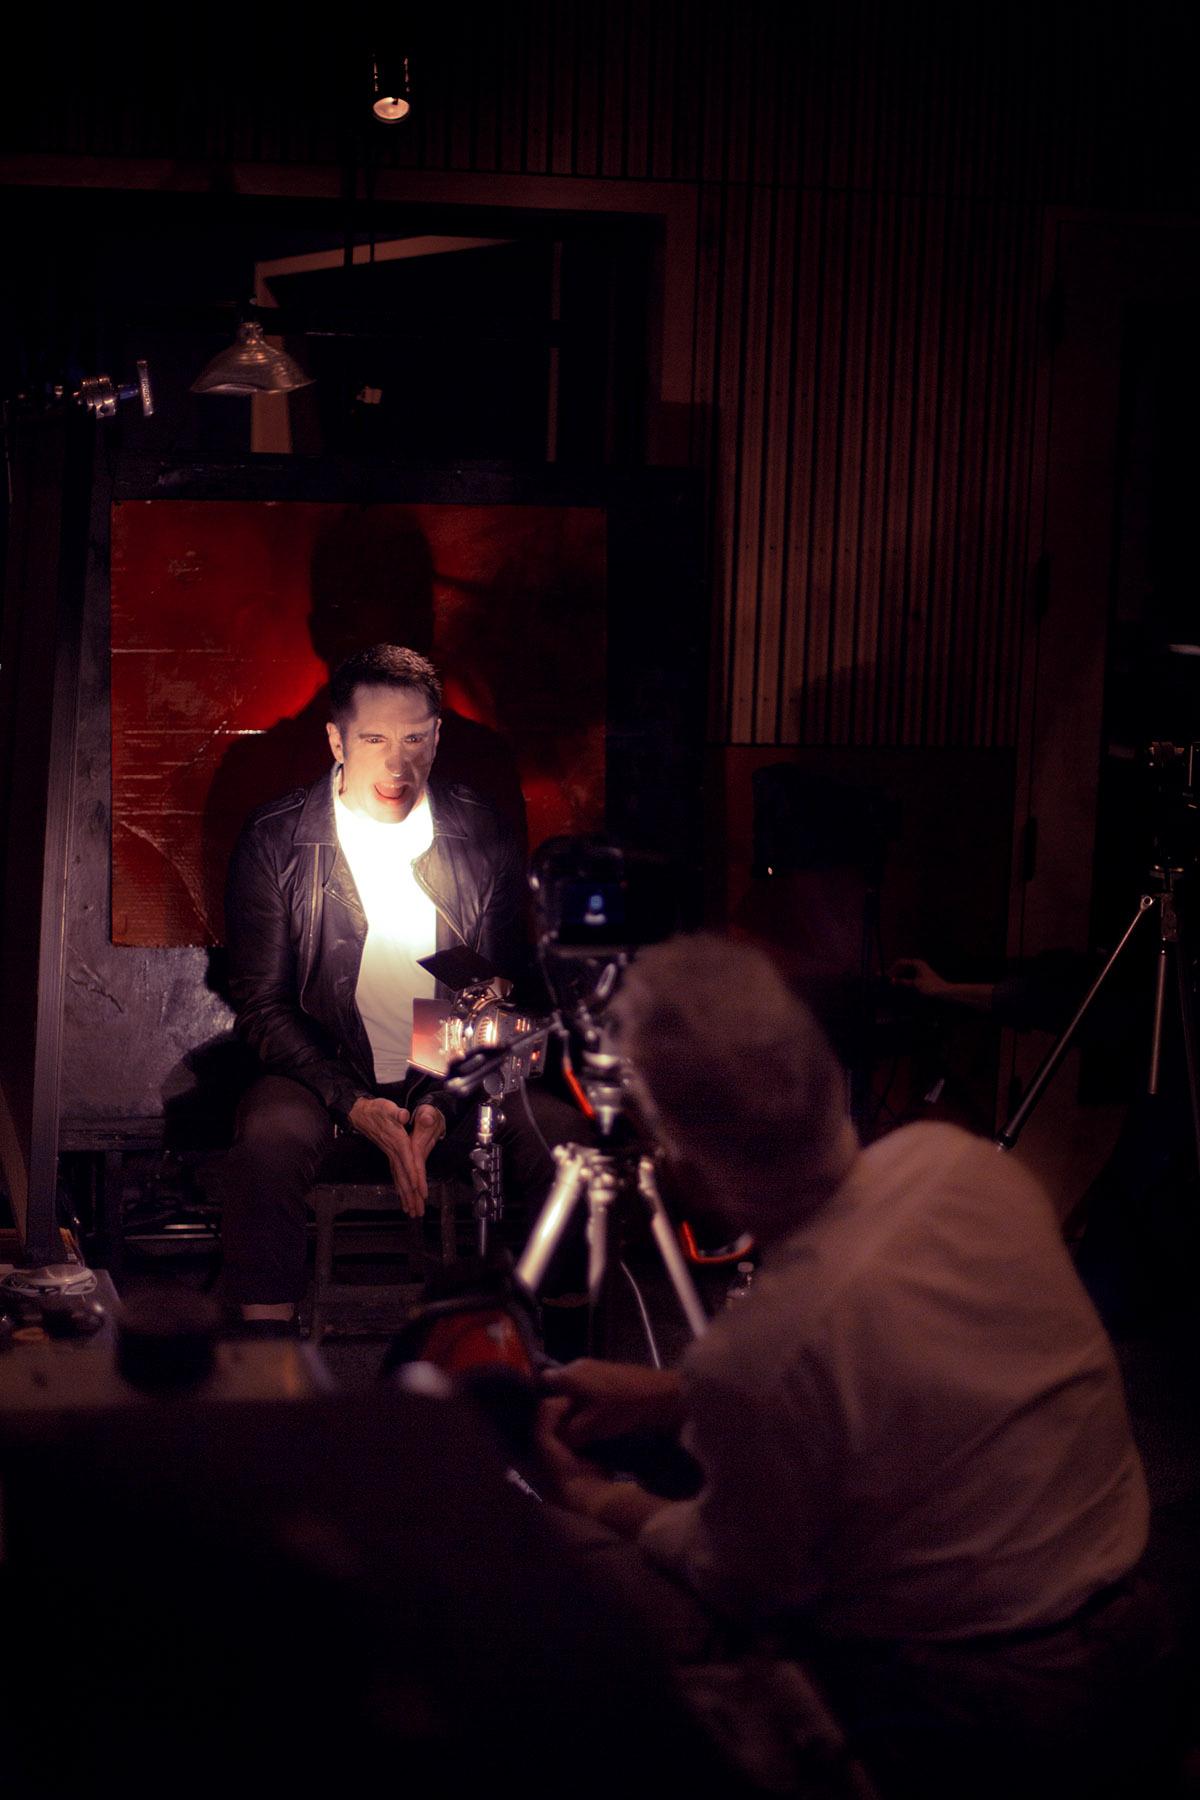 David Lynch filming Nine Inch Nails Video | WANDERLUST